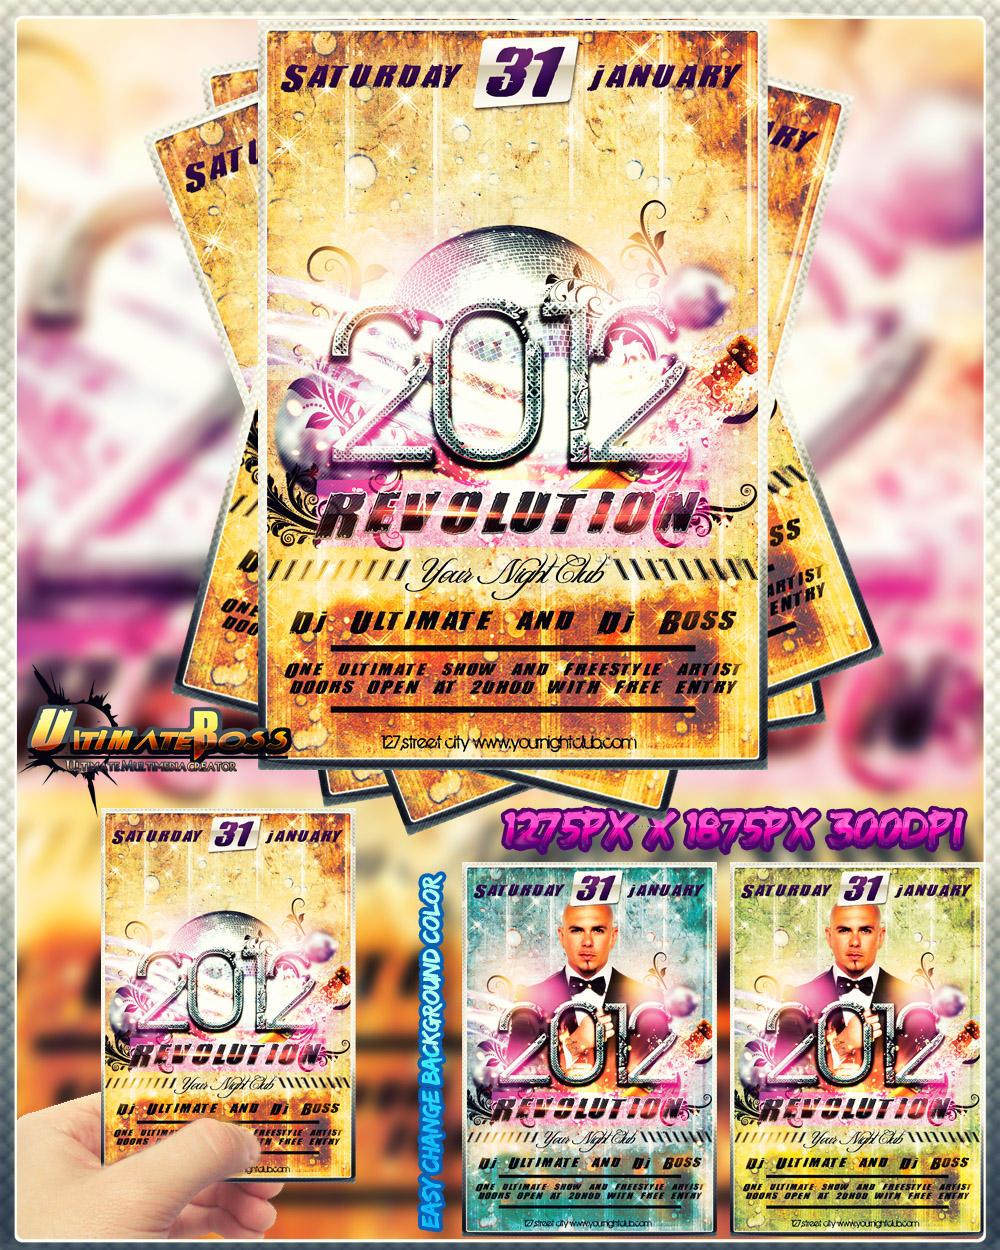 Freemium 2012 Revolution flyer by ultimateboss